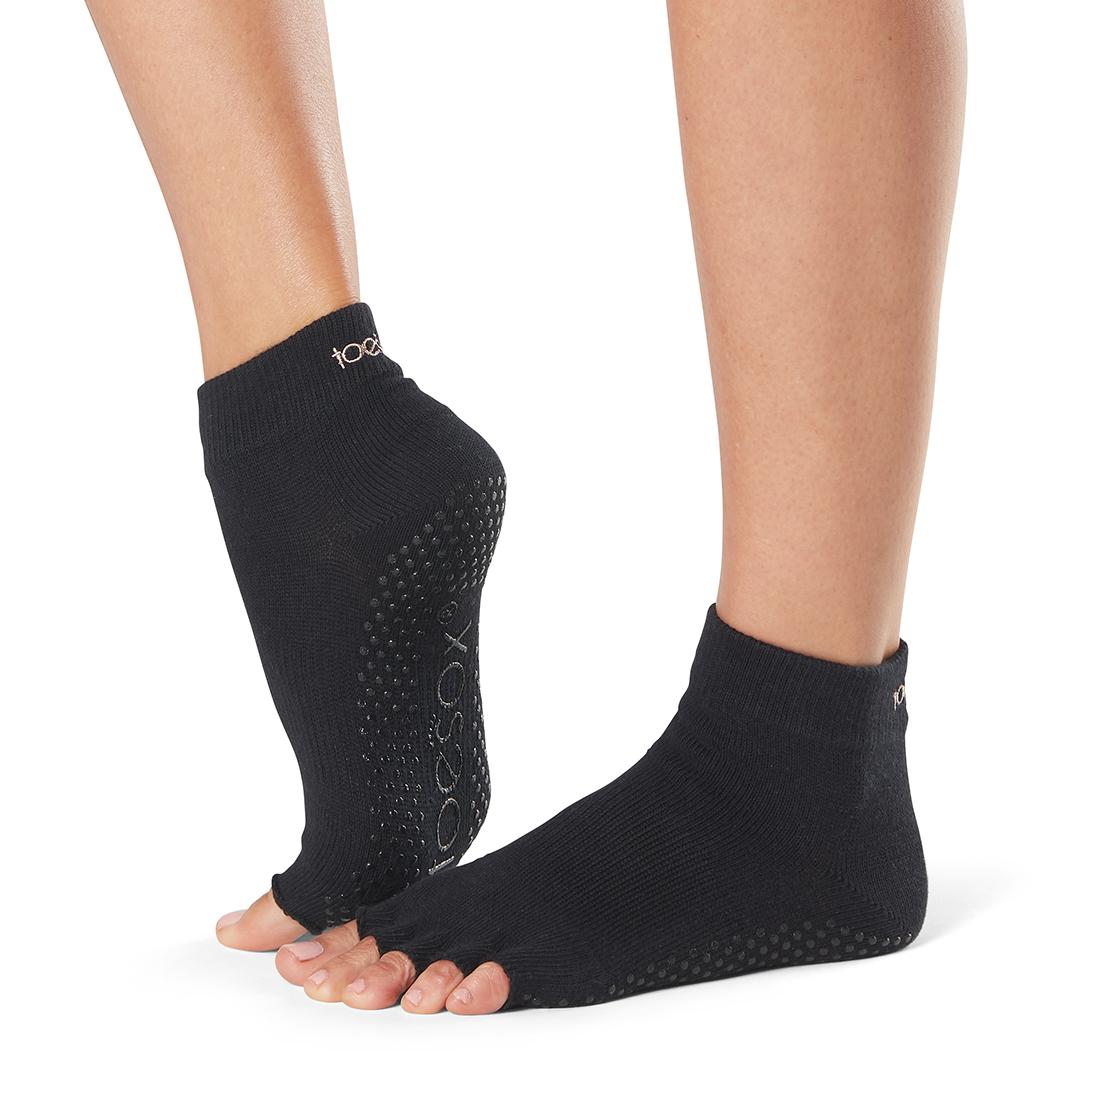 Yogasocken ToeSox Ankle Half Toe Black - 1